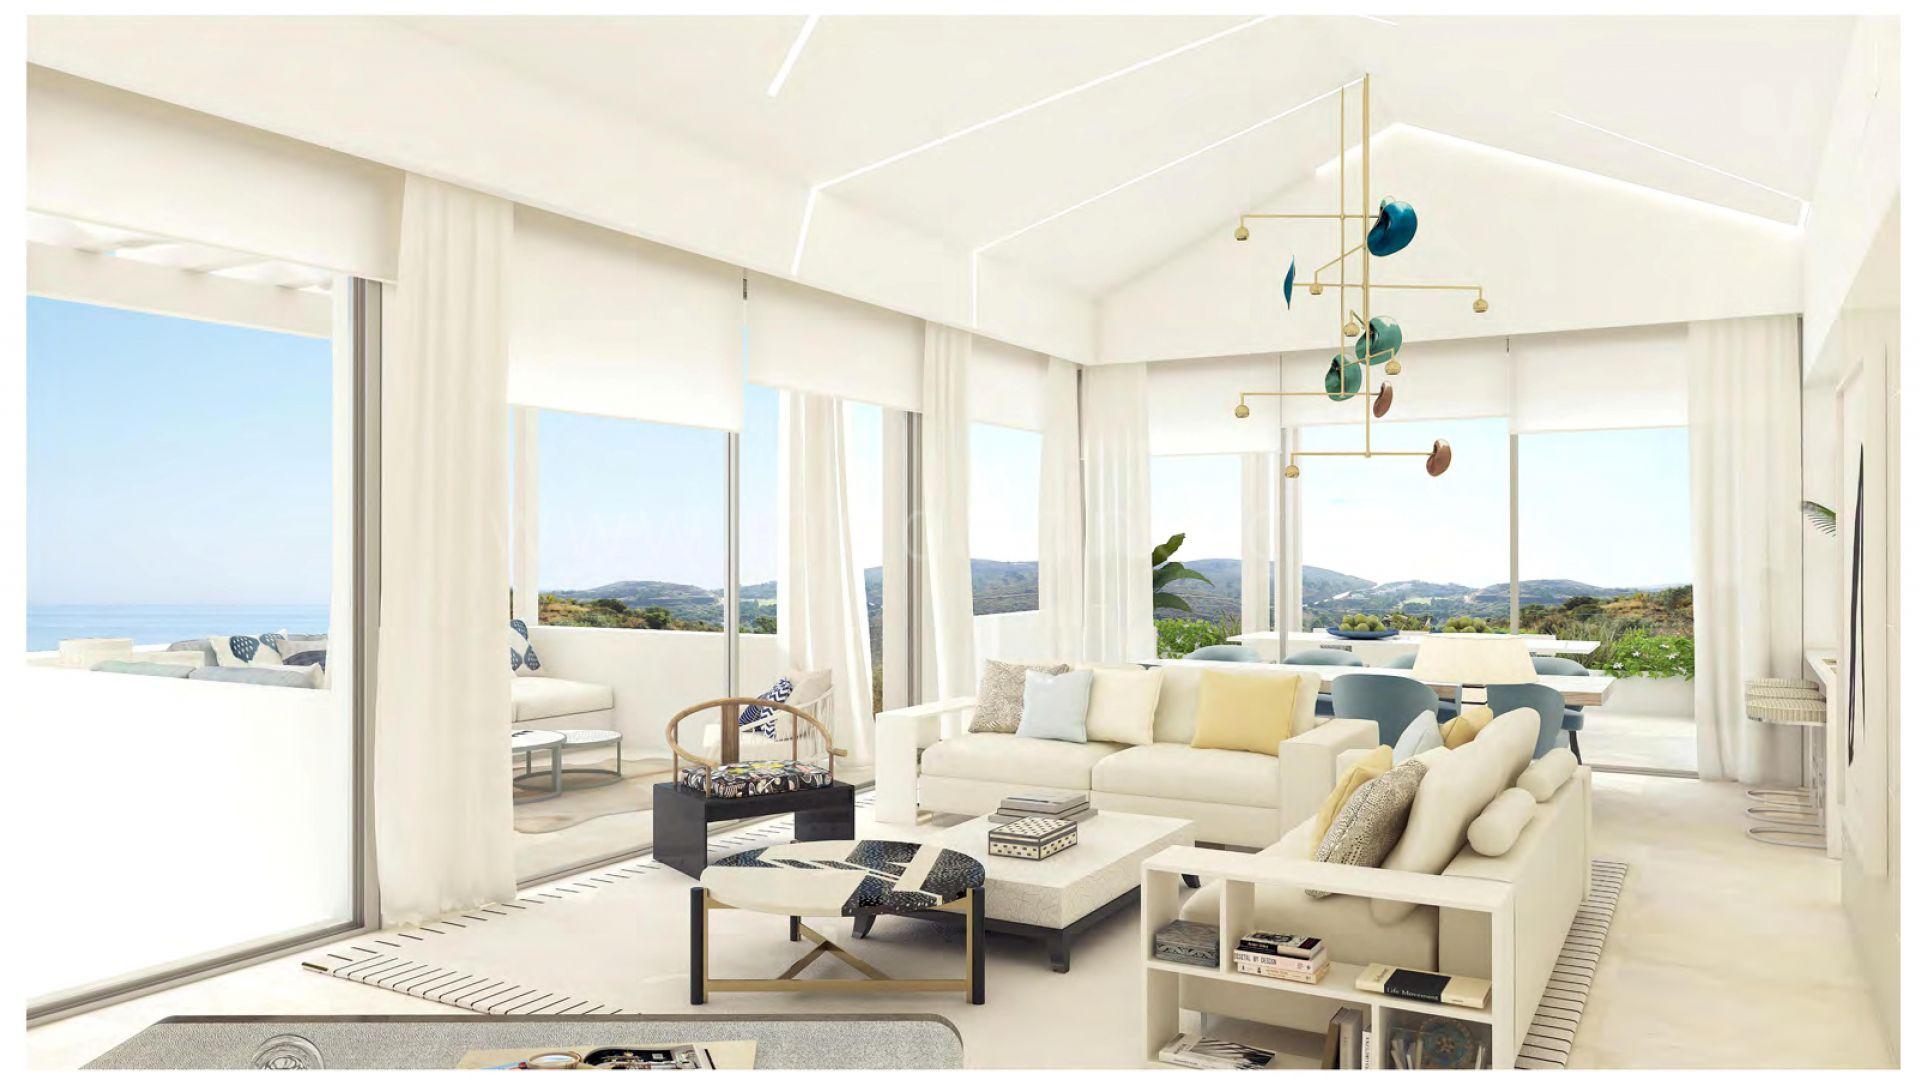 Marbella Club Hills Benahavis Off Plan Contemporary Apartments